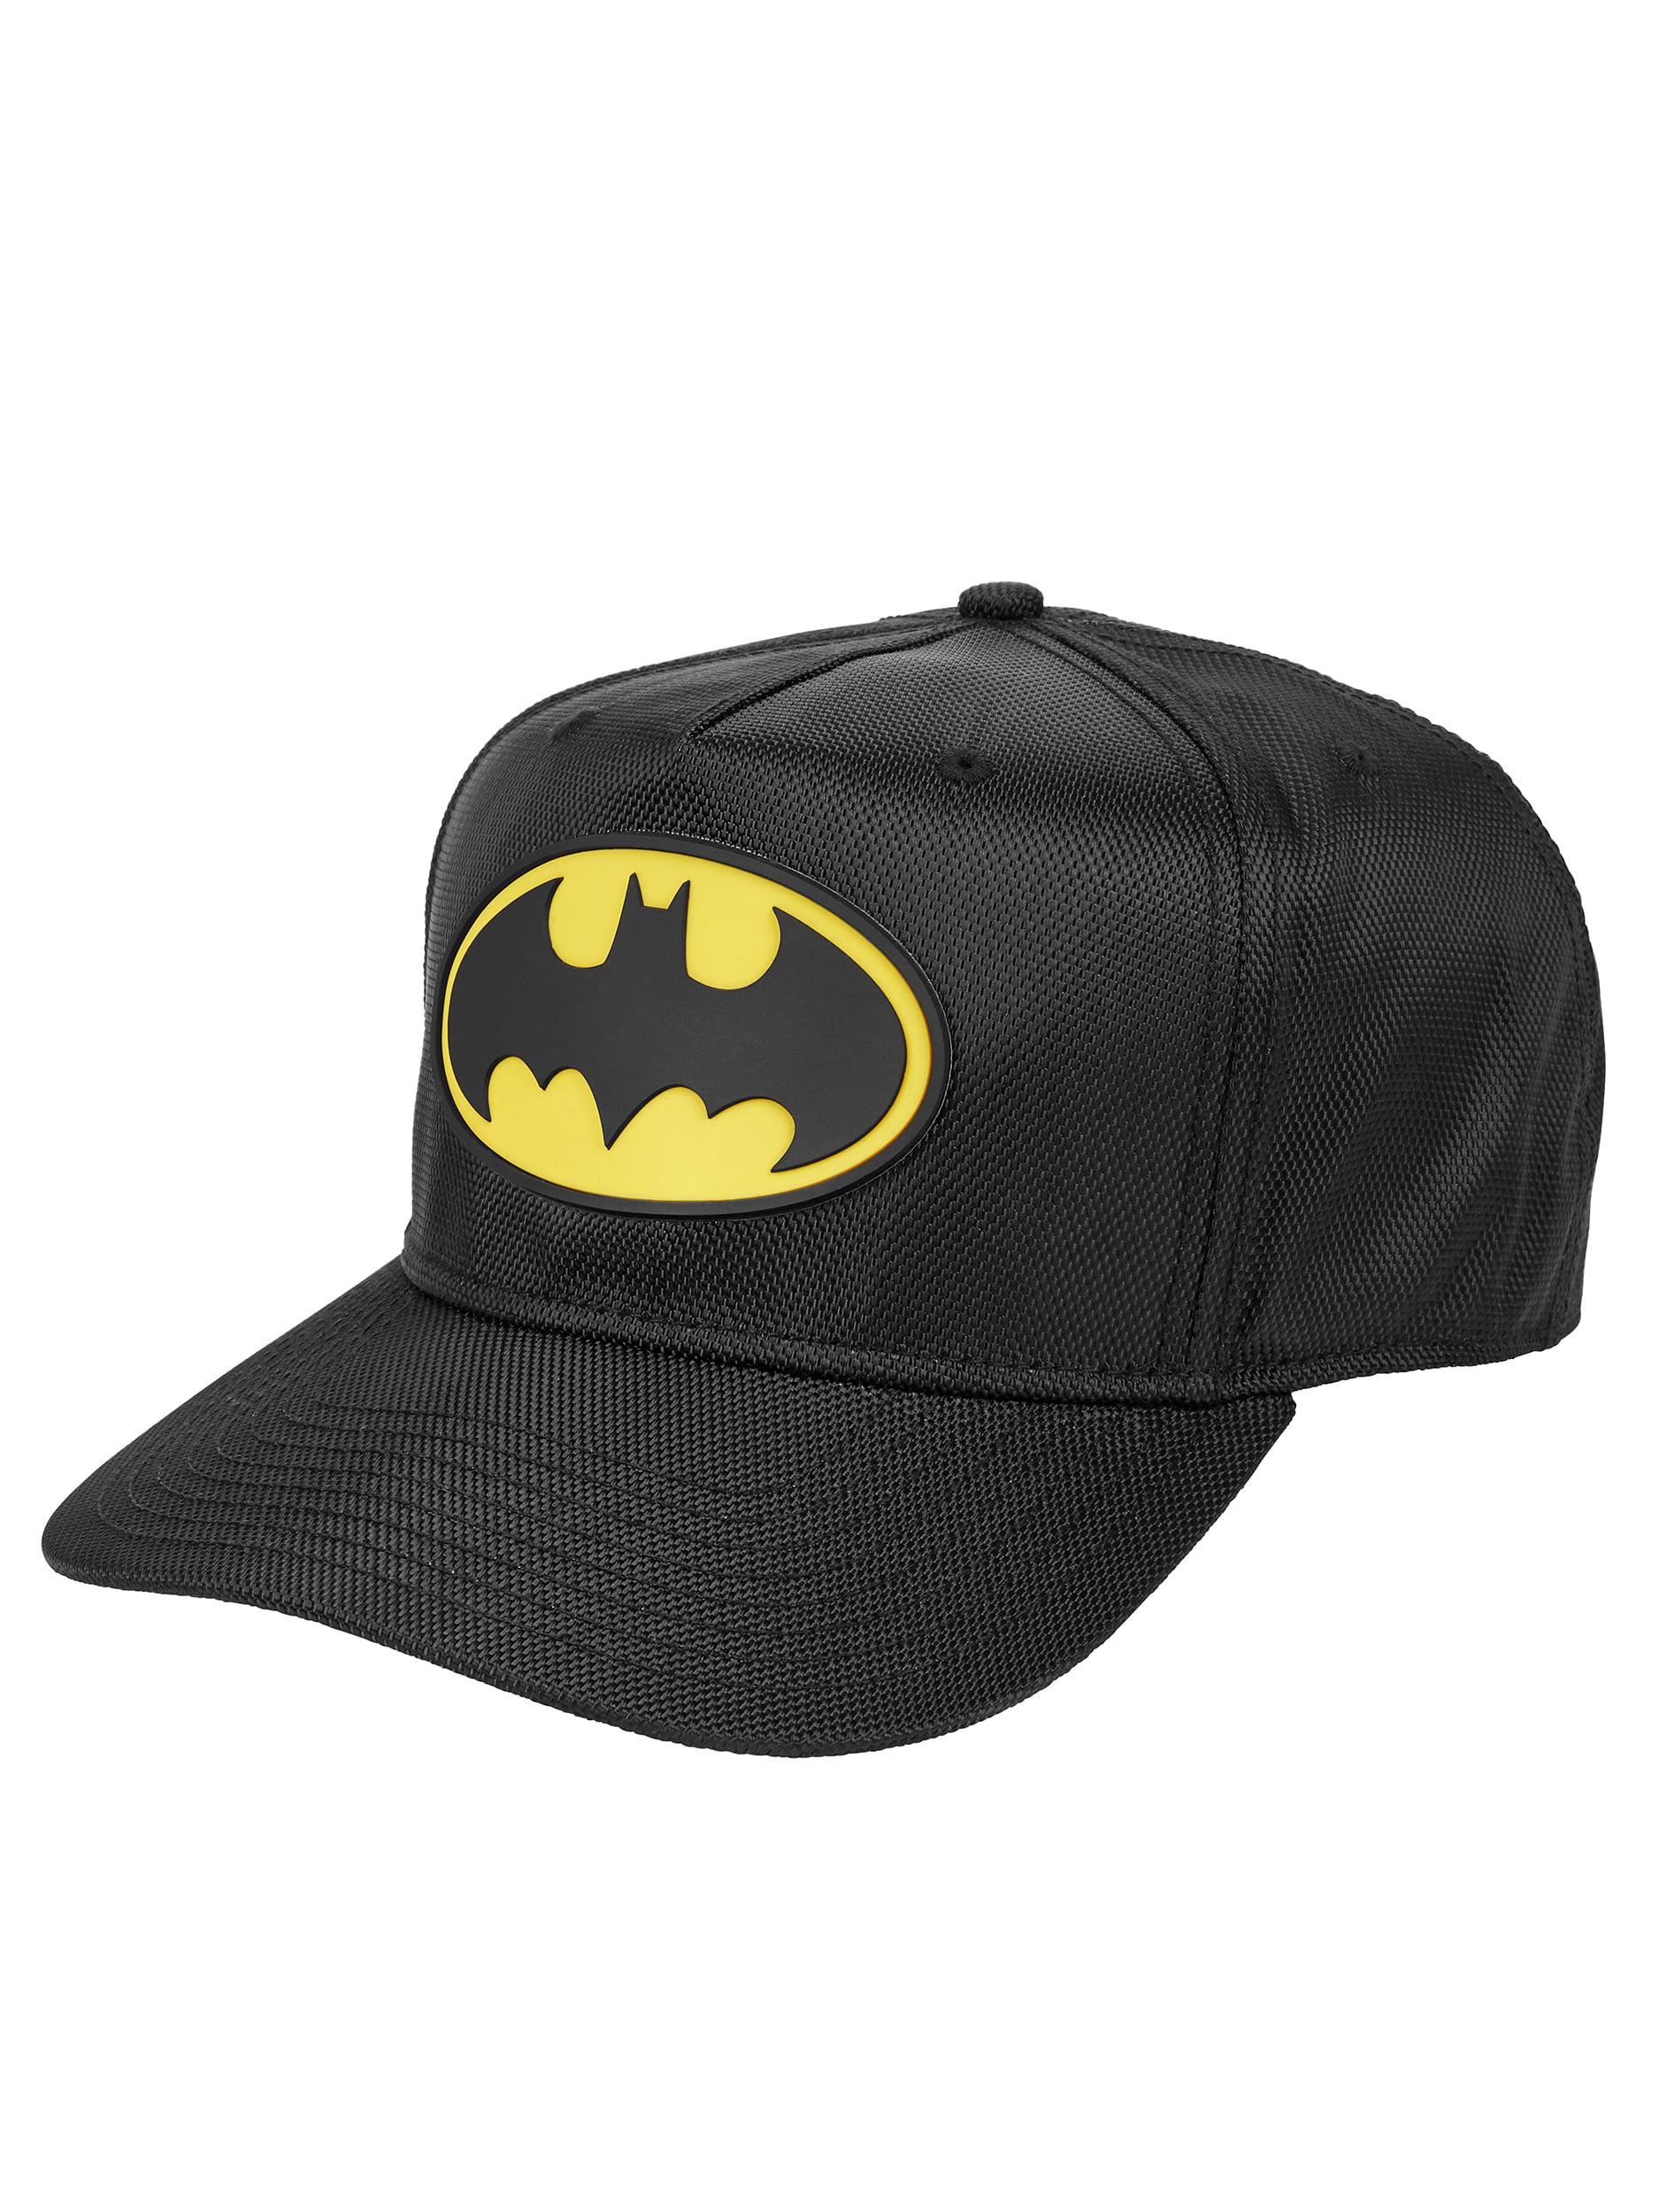 Men's DC Comics Batman Ballistic Nylon Cap with Rubber Weld Logo